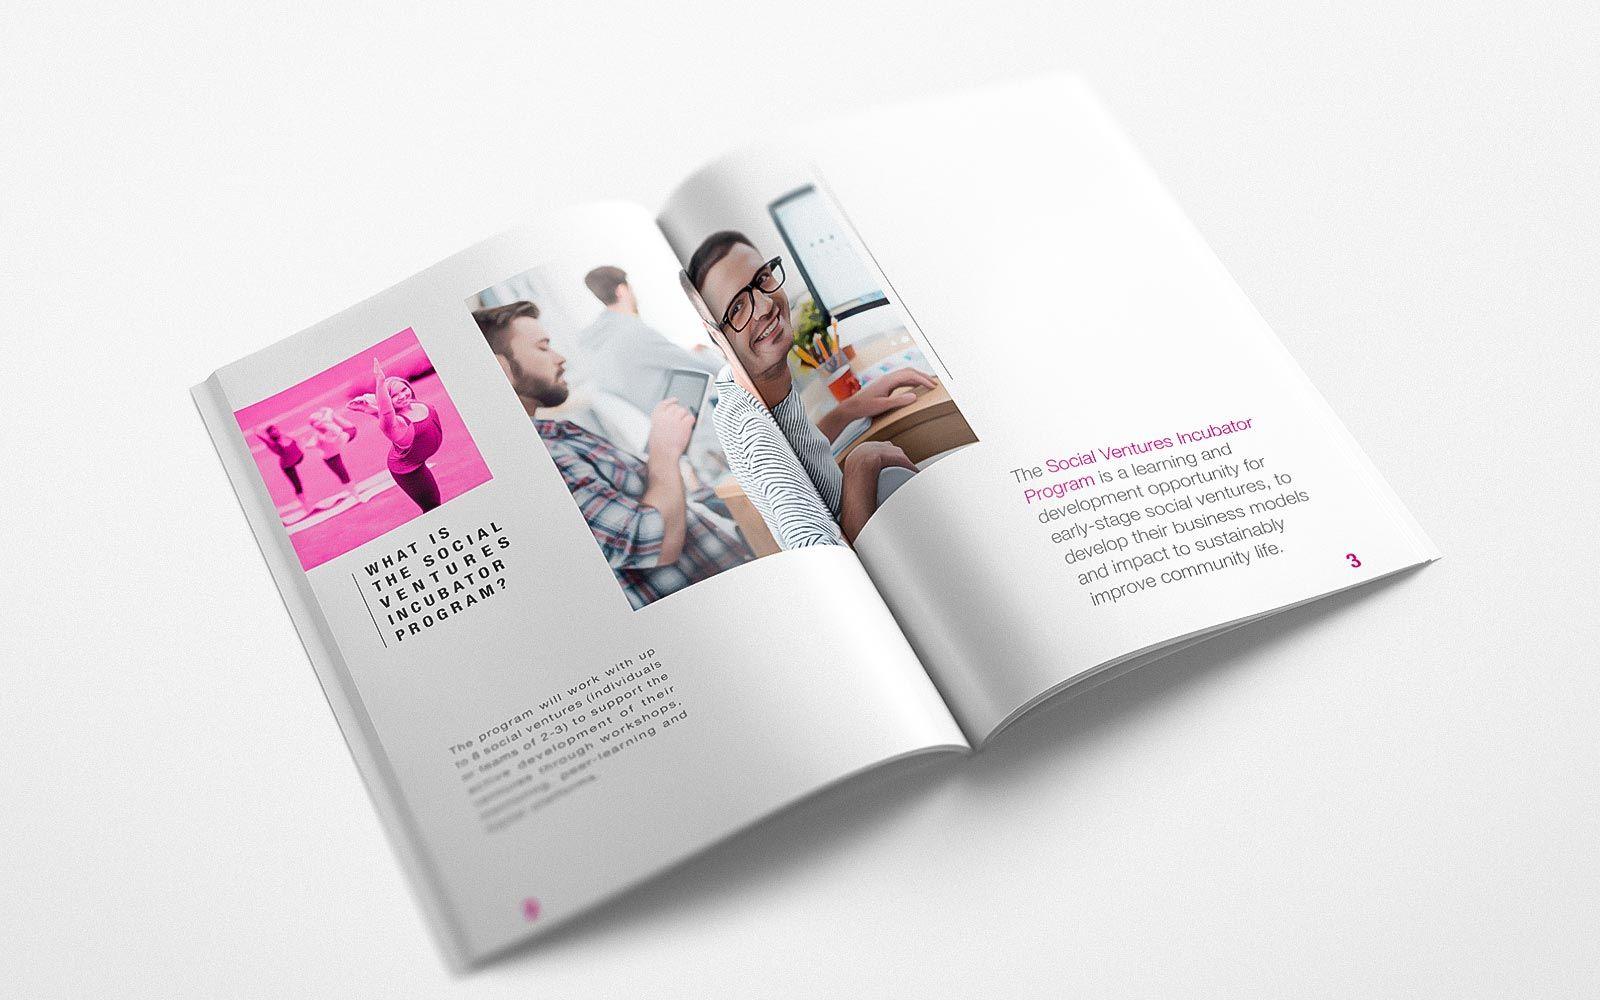 Aldershots Provides You Best And Creative Web Design Studios In Adelaide Seo Services In Adelaide Web Design Studio Graphic Design Company Creative Web Design